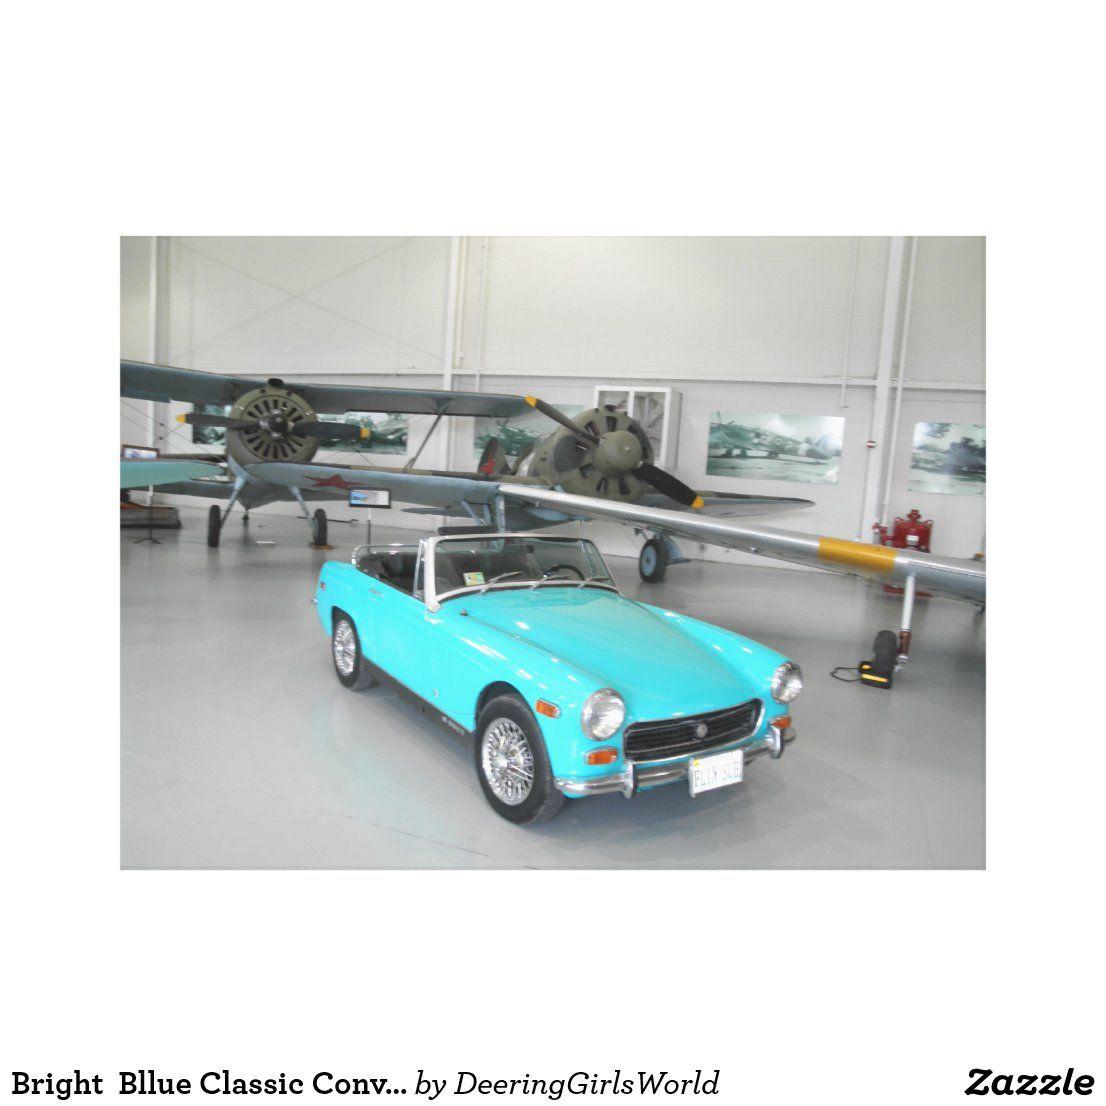 Bright  Bllue Classic Convertibe Car Canvas Print | Zazzle.com